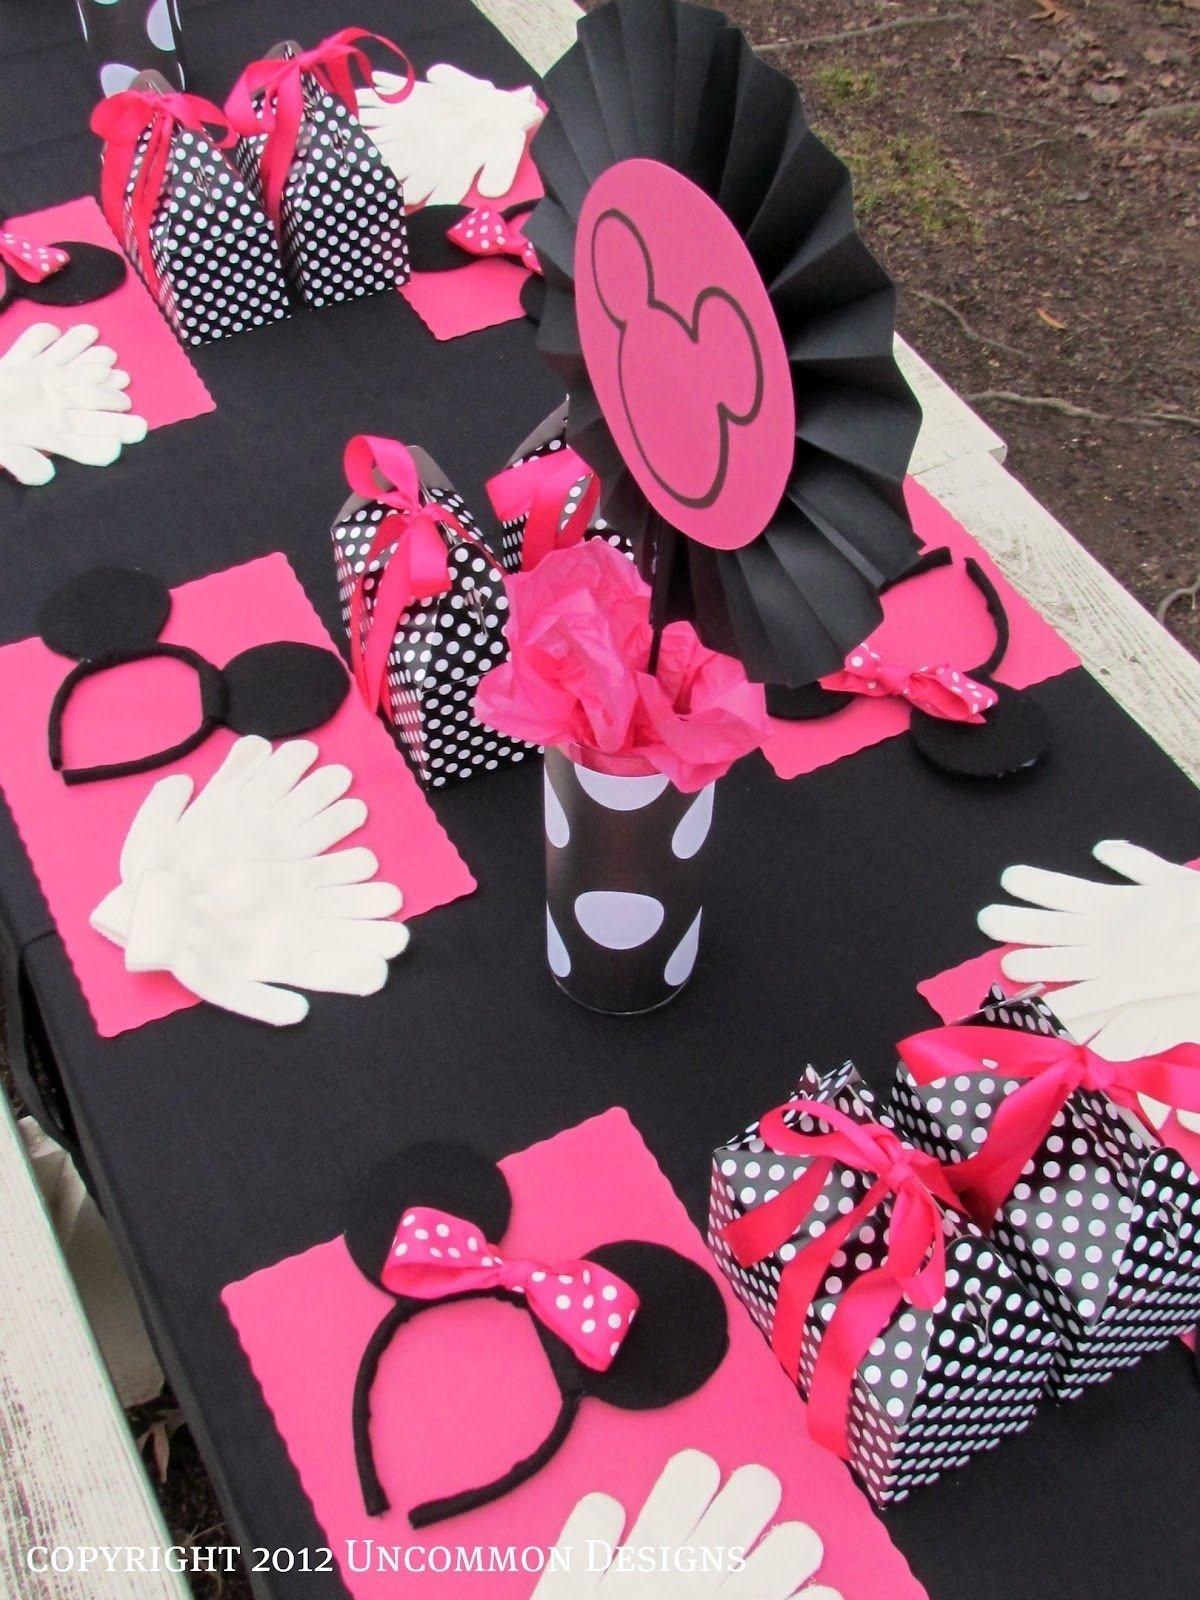 10 Fashionable Minnie Mouse First Birthday Ideas a minnie mouse birthday party minnie mouse mice and birthdays 2021